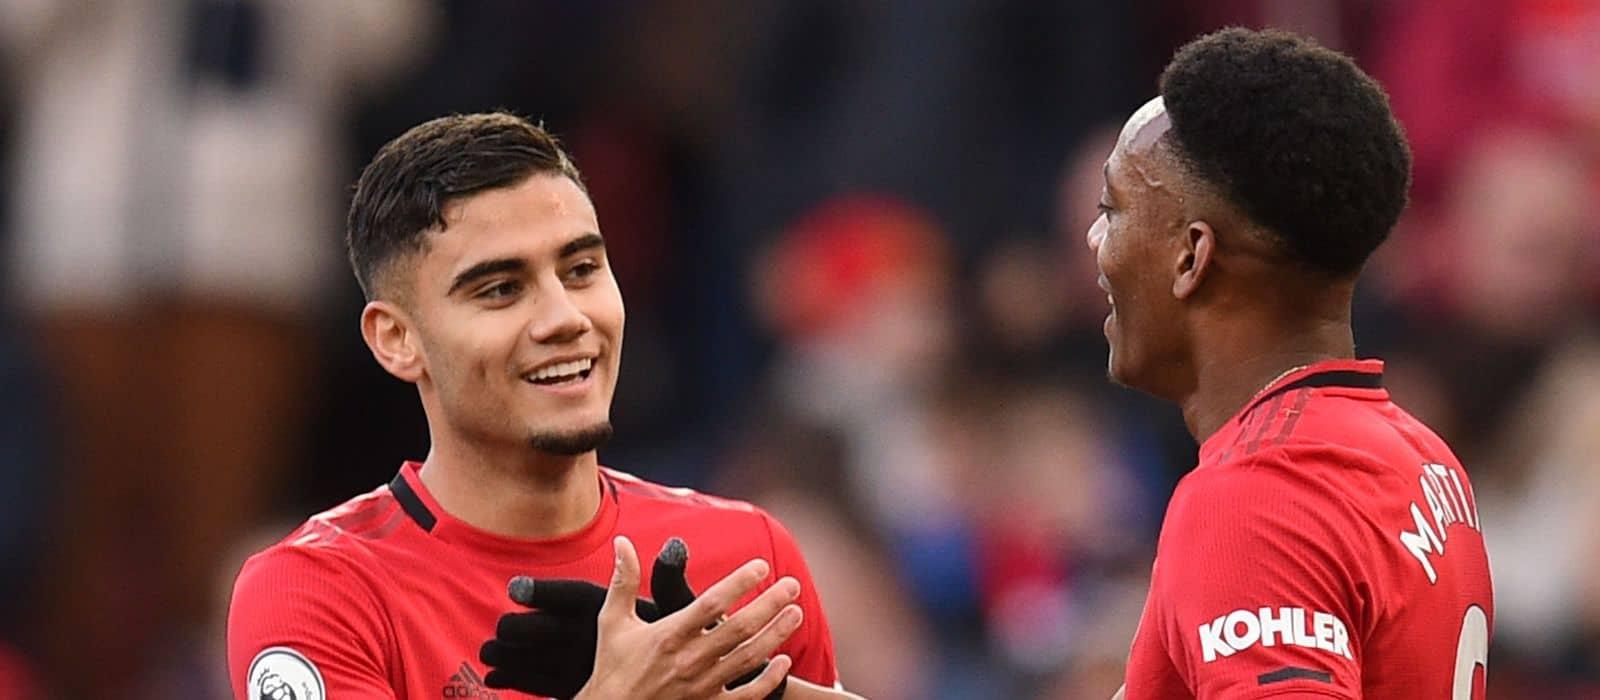 Photo gallery: Manchester United 3-1 Brighton & Hove Albion